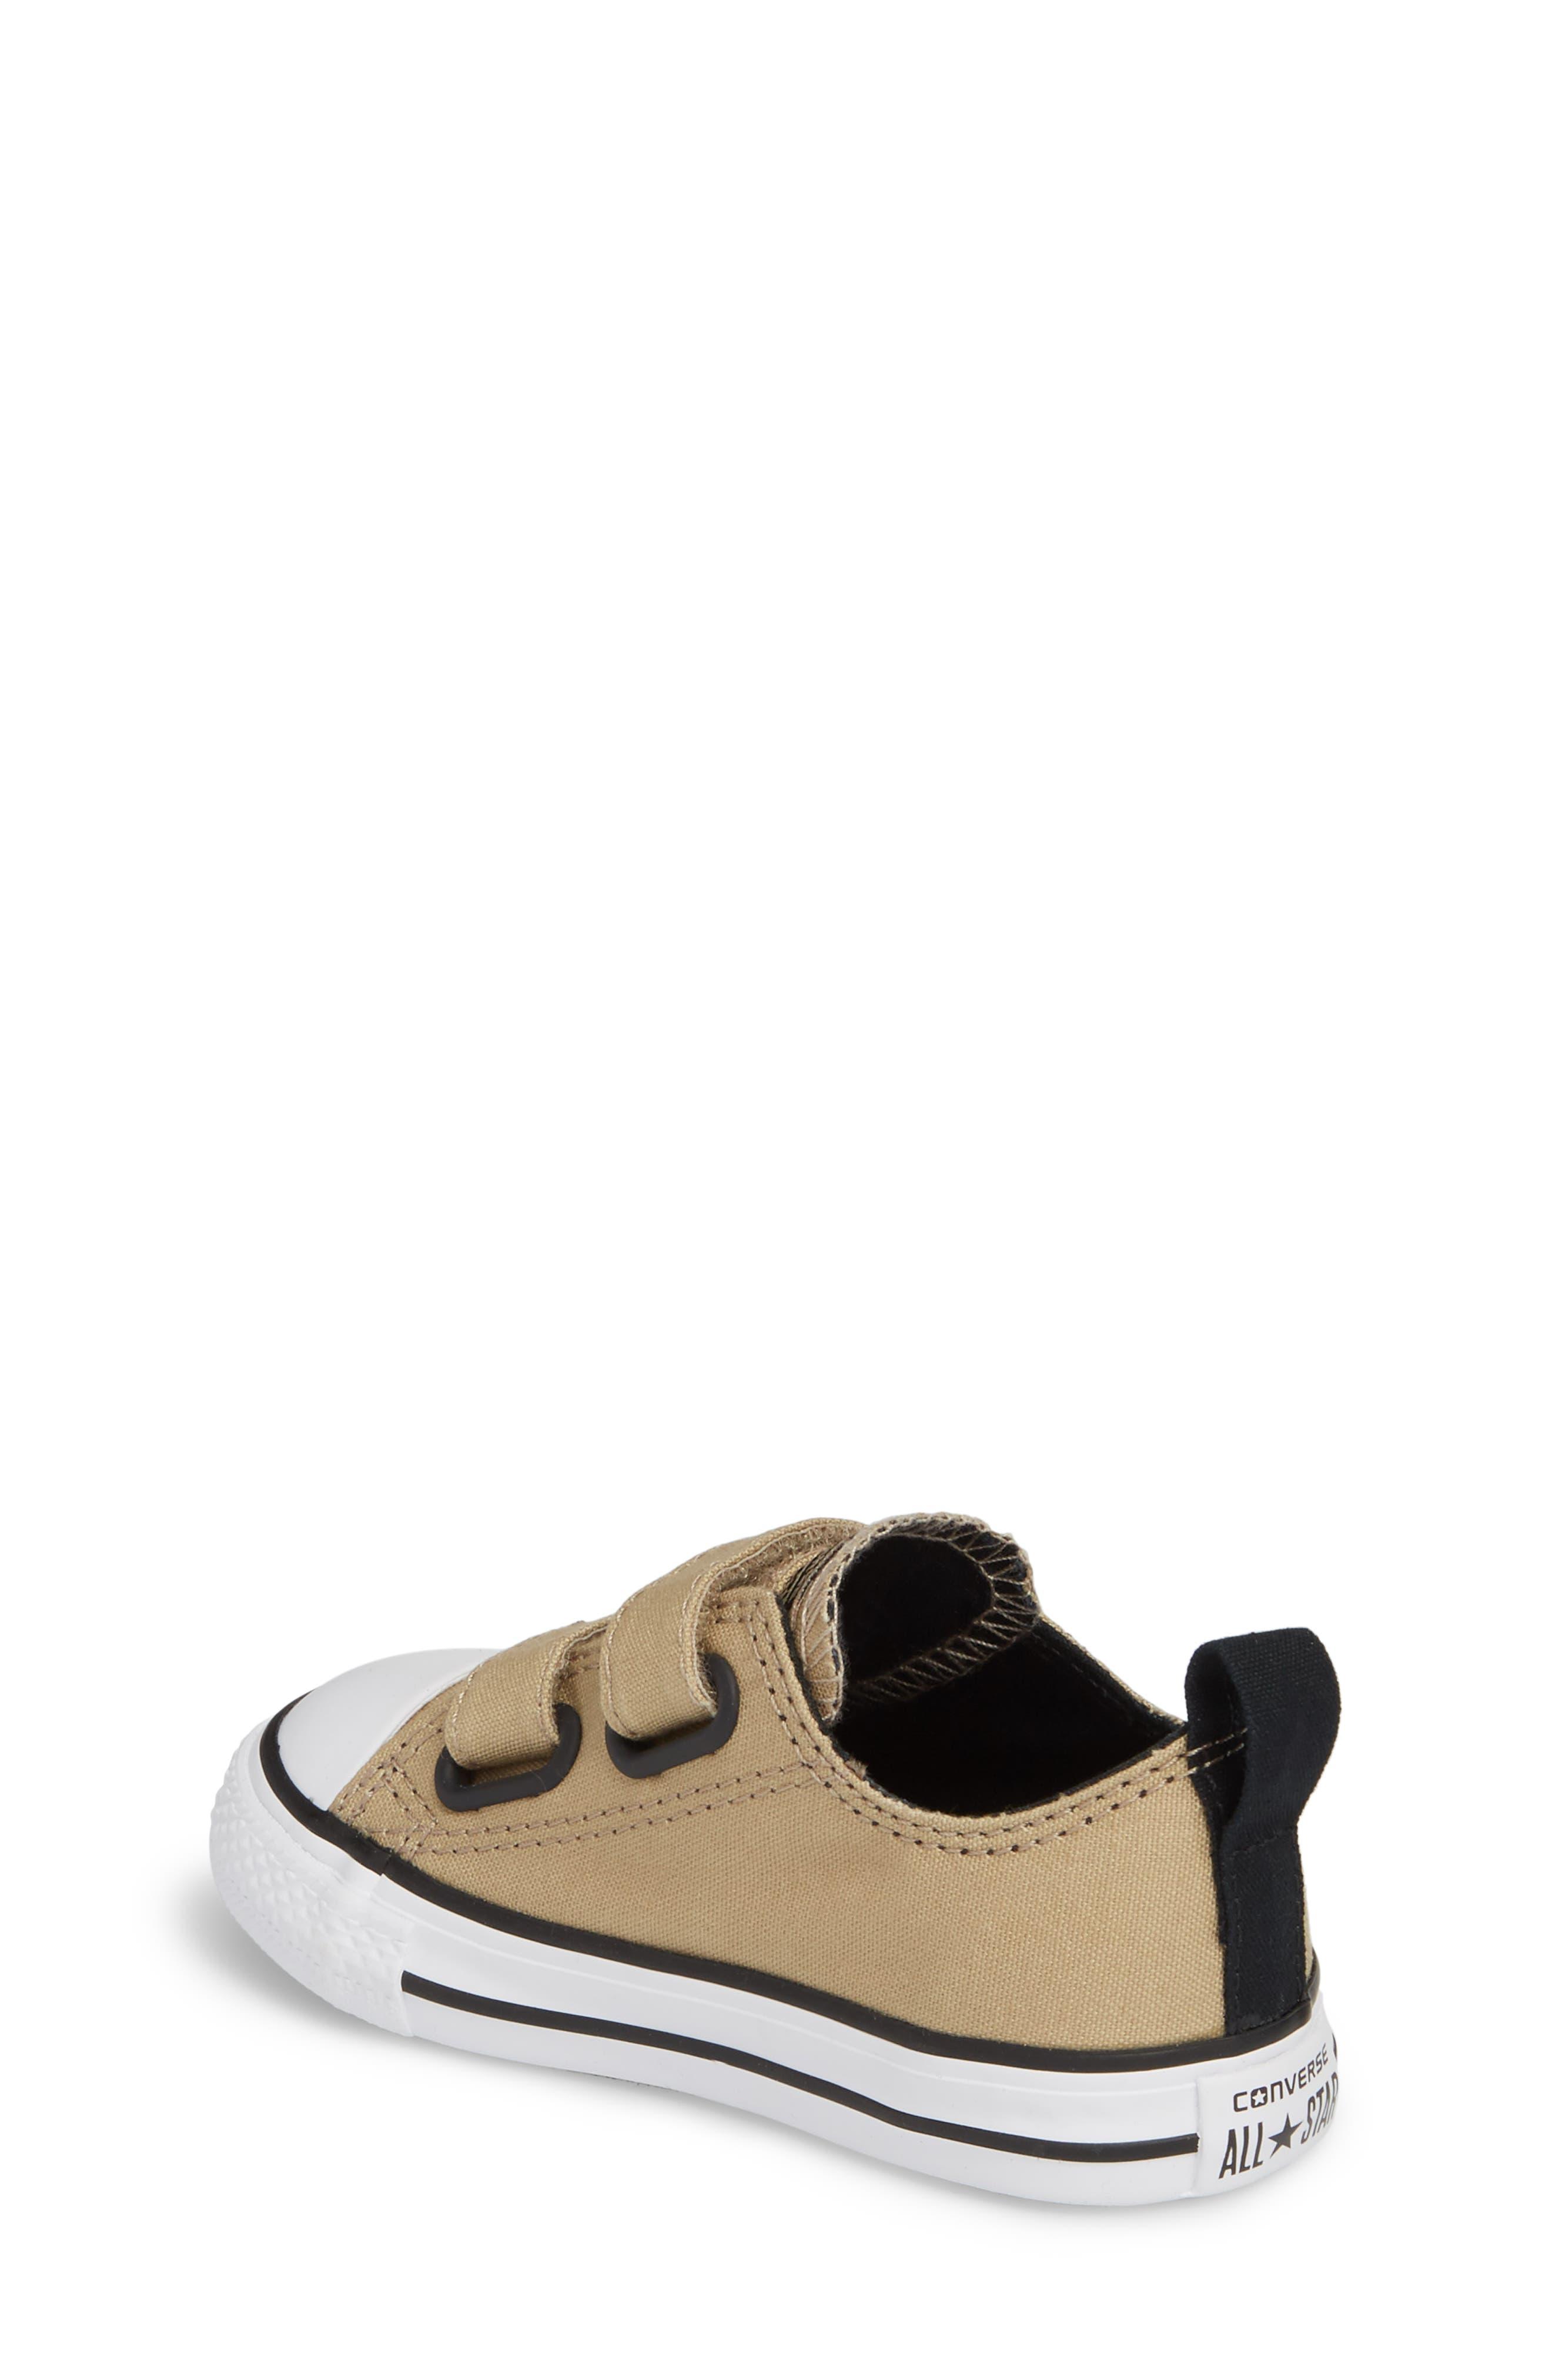 All Star<sup>®</sup> 2V Low Top Sneaker,                             Alternate thumbnail 2, color,                             Vintage Khaki